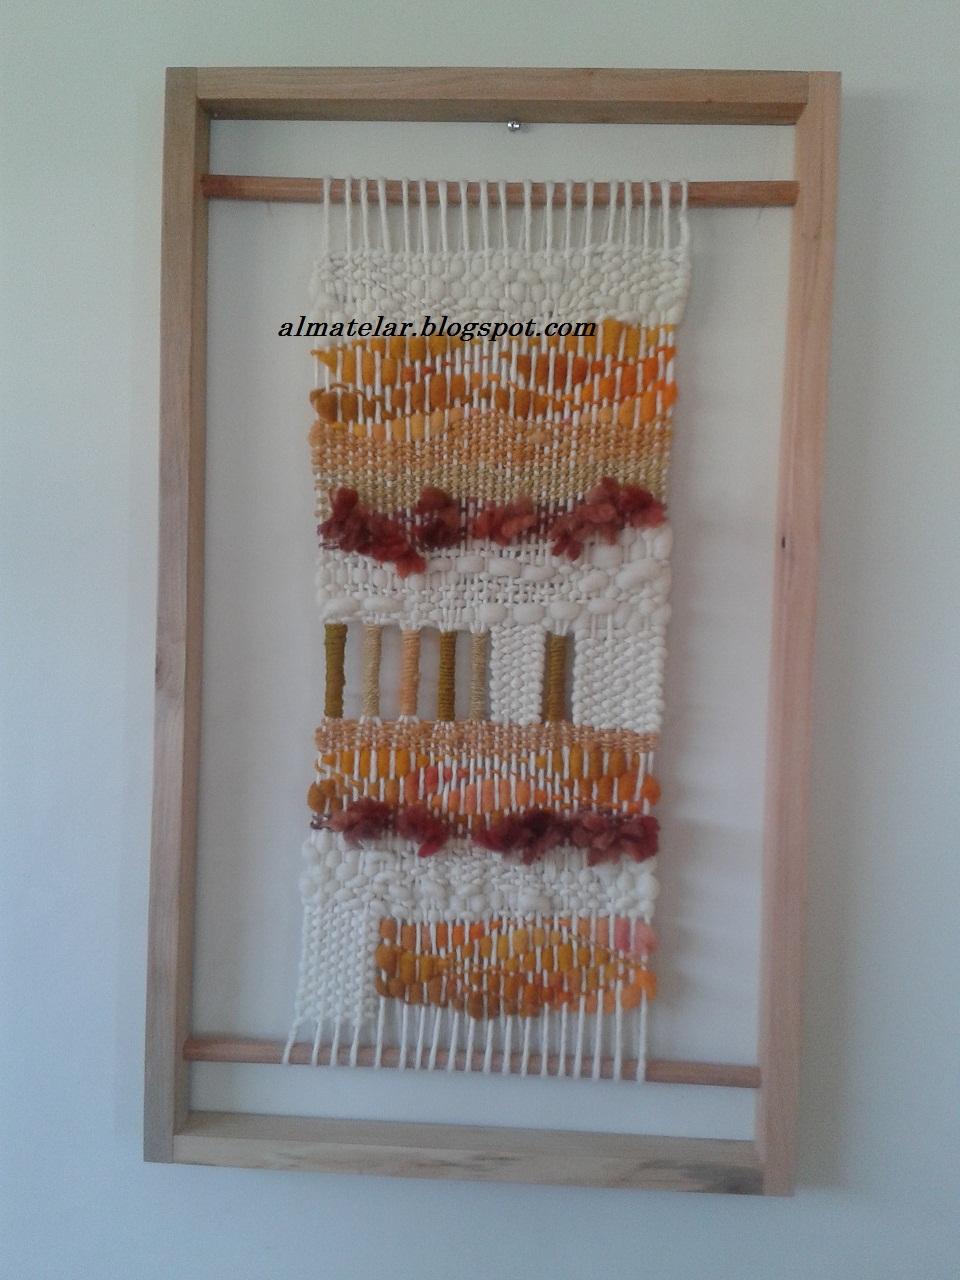 almatelar murales y tapices: telares enmarcados